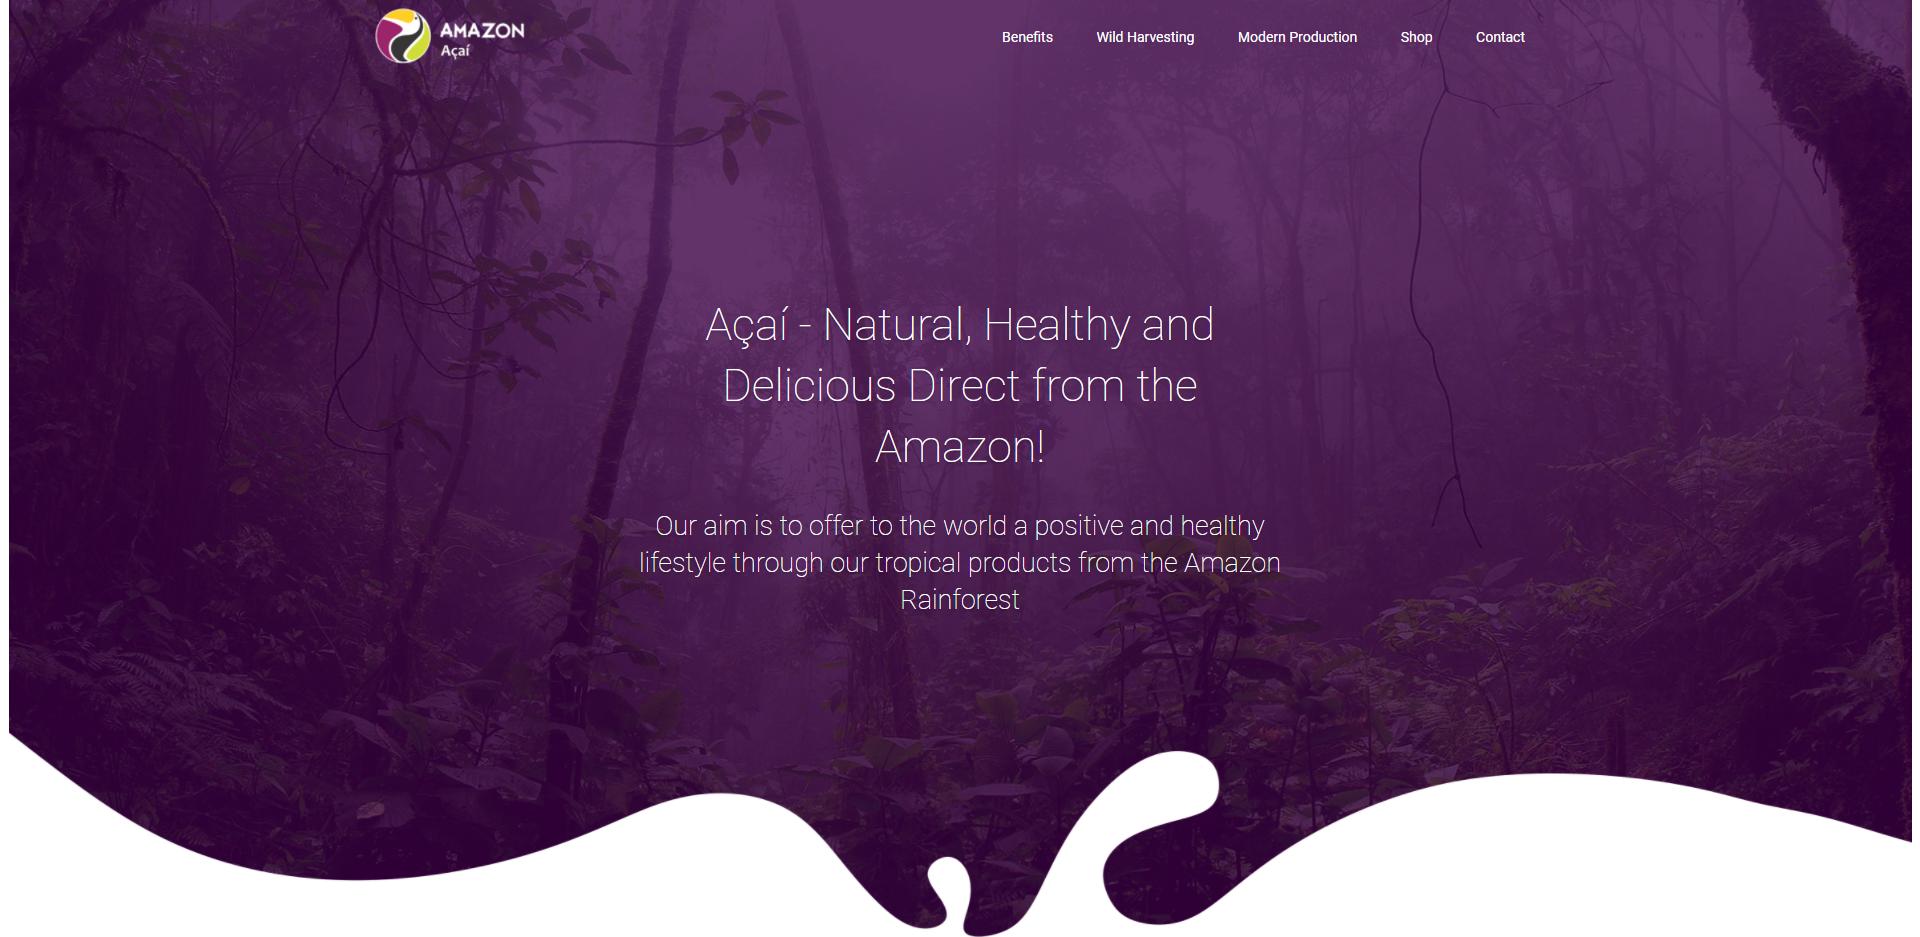 Amazon Acai